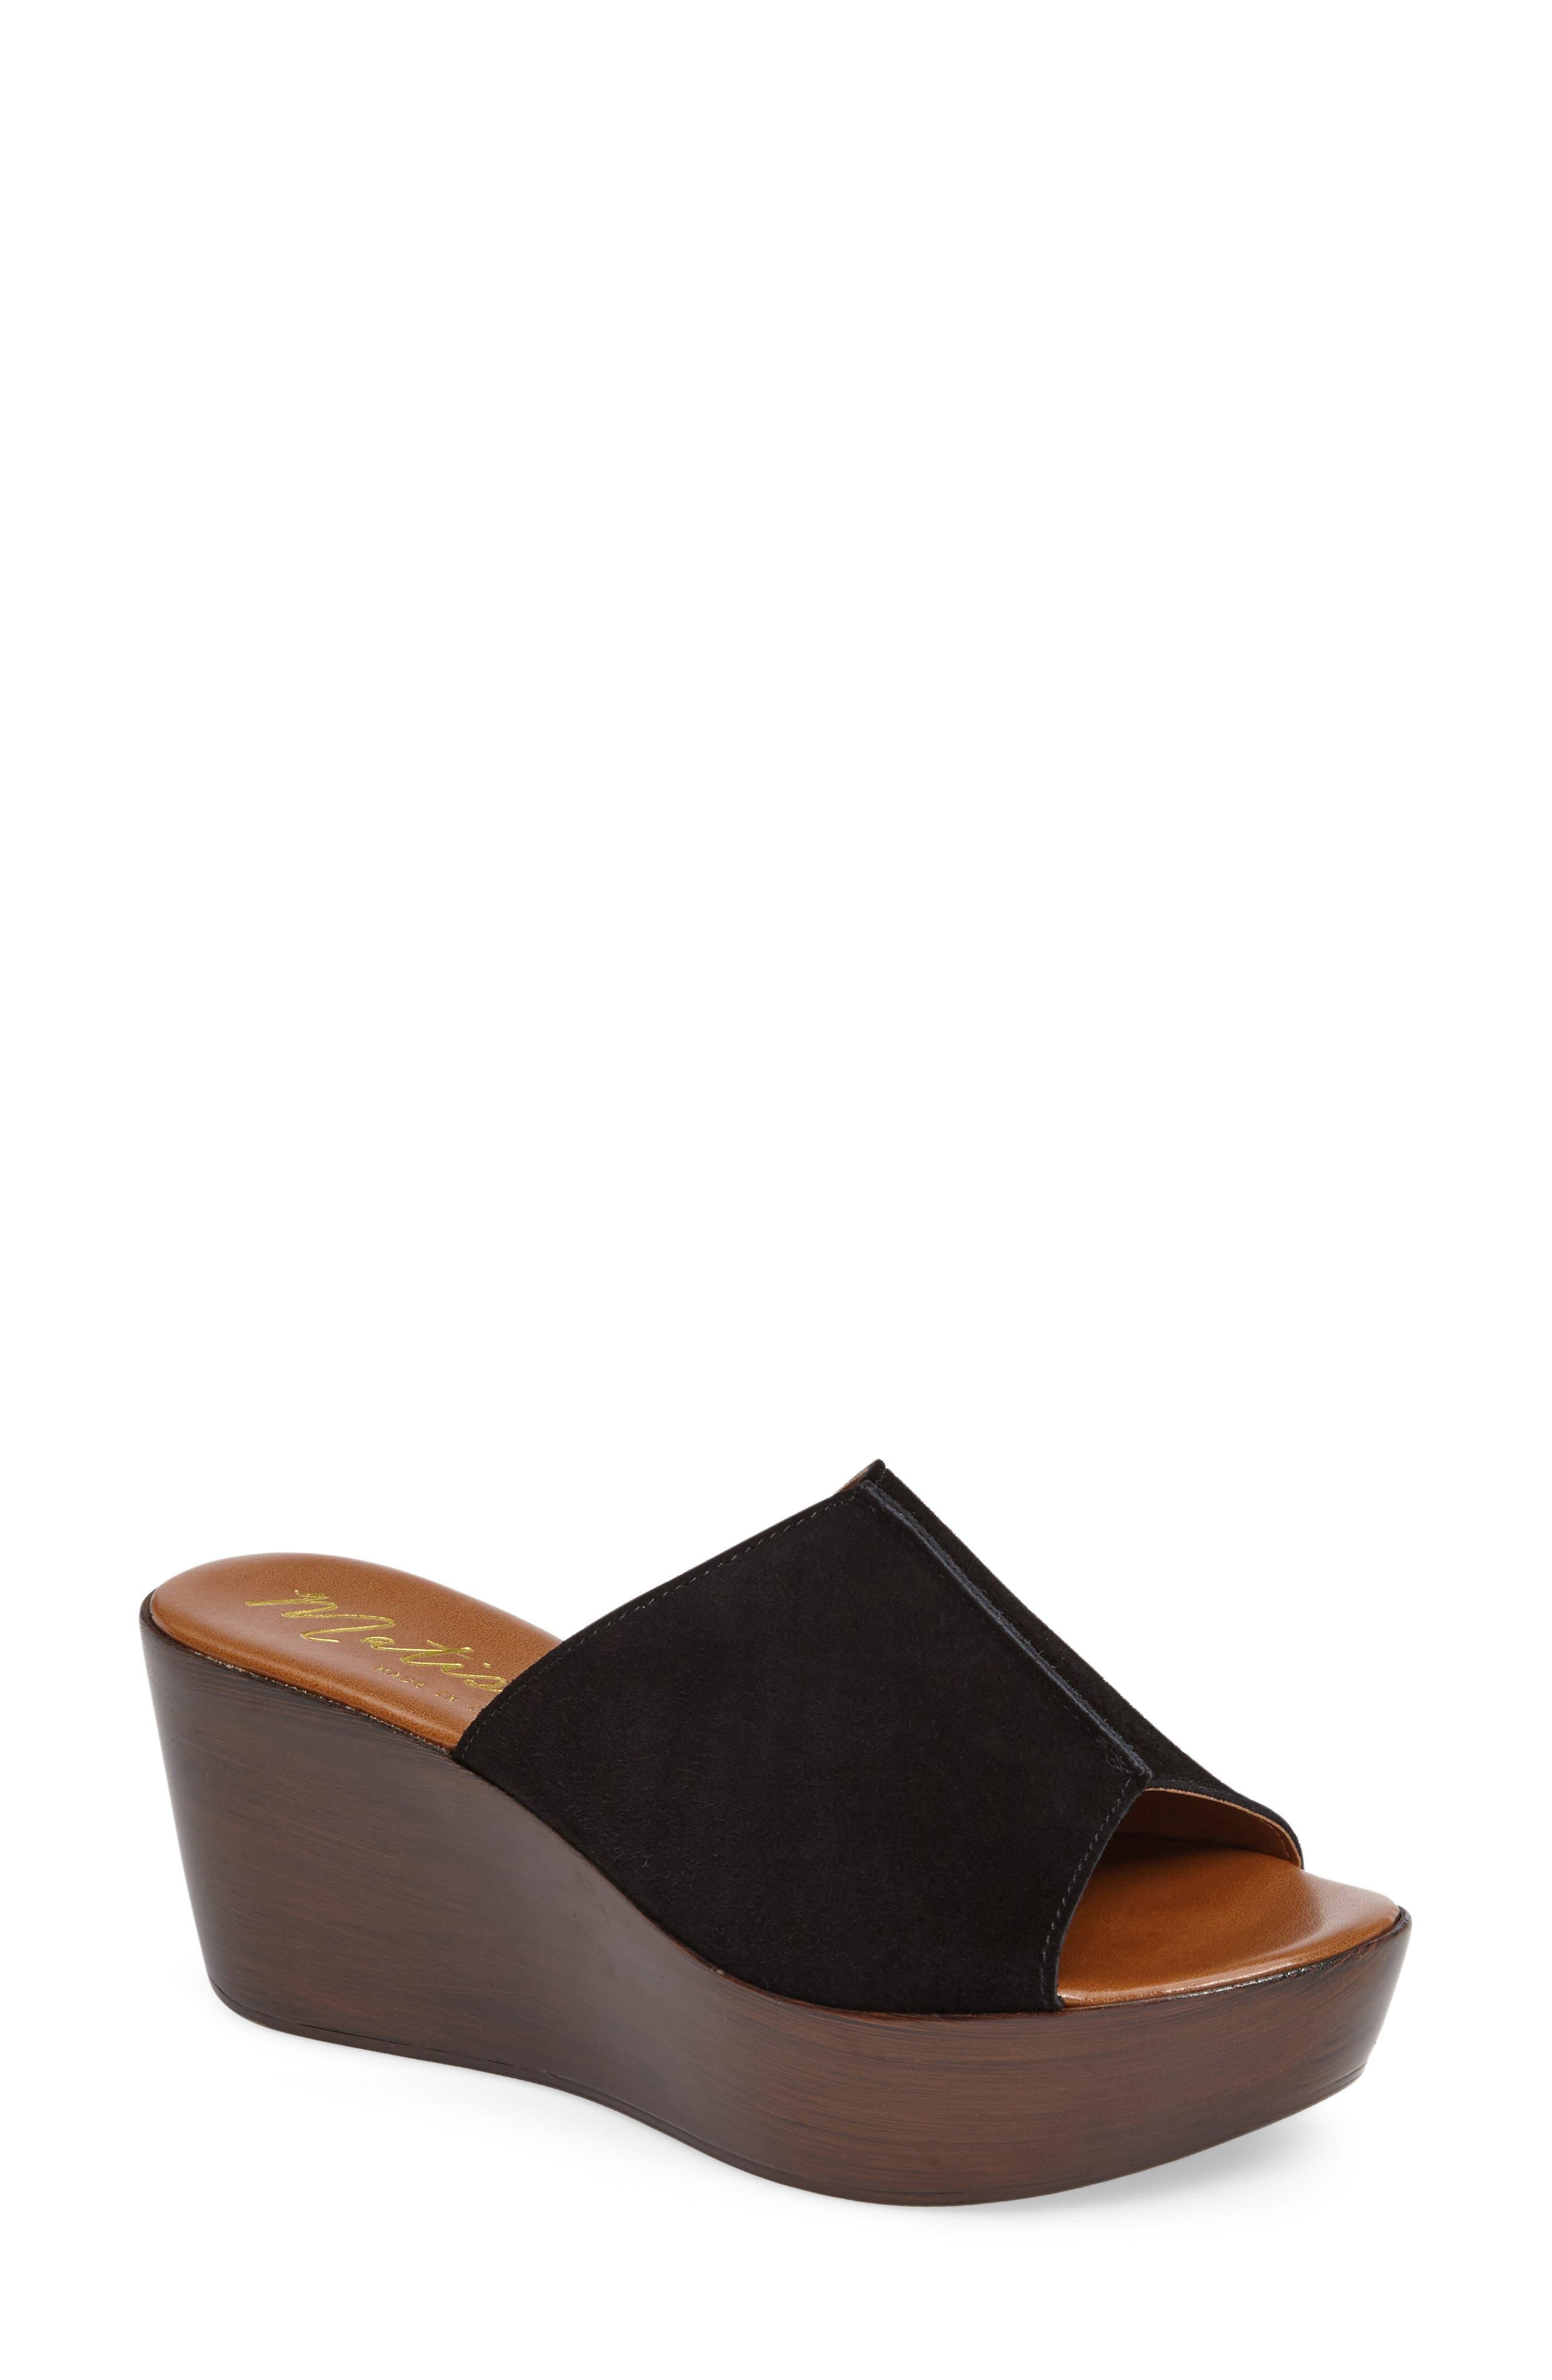 Platform Slide Sandal,                             Main thumbnail 1, color,                             017